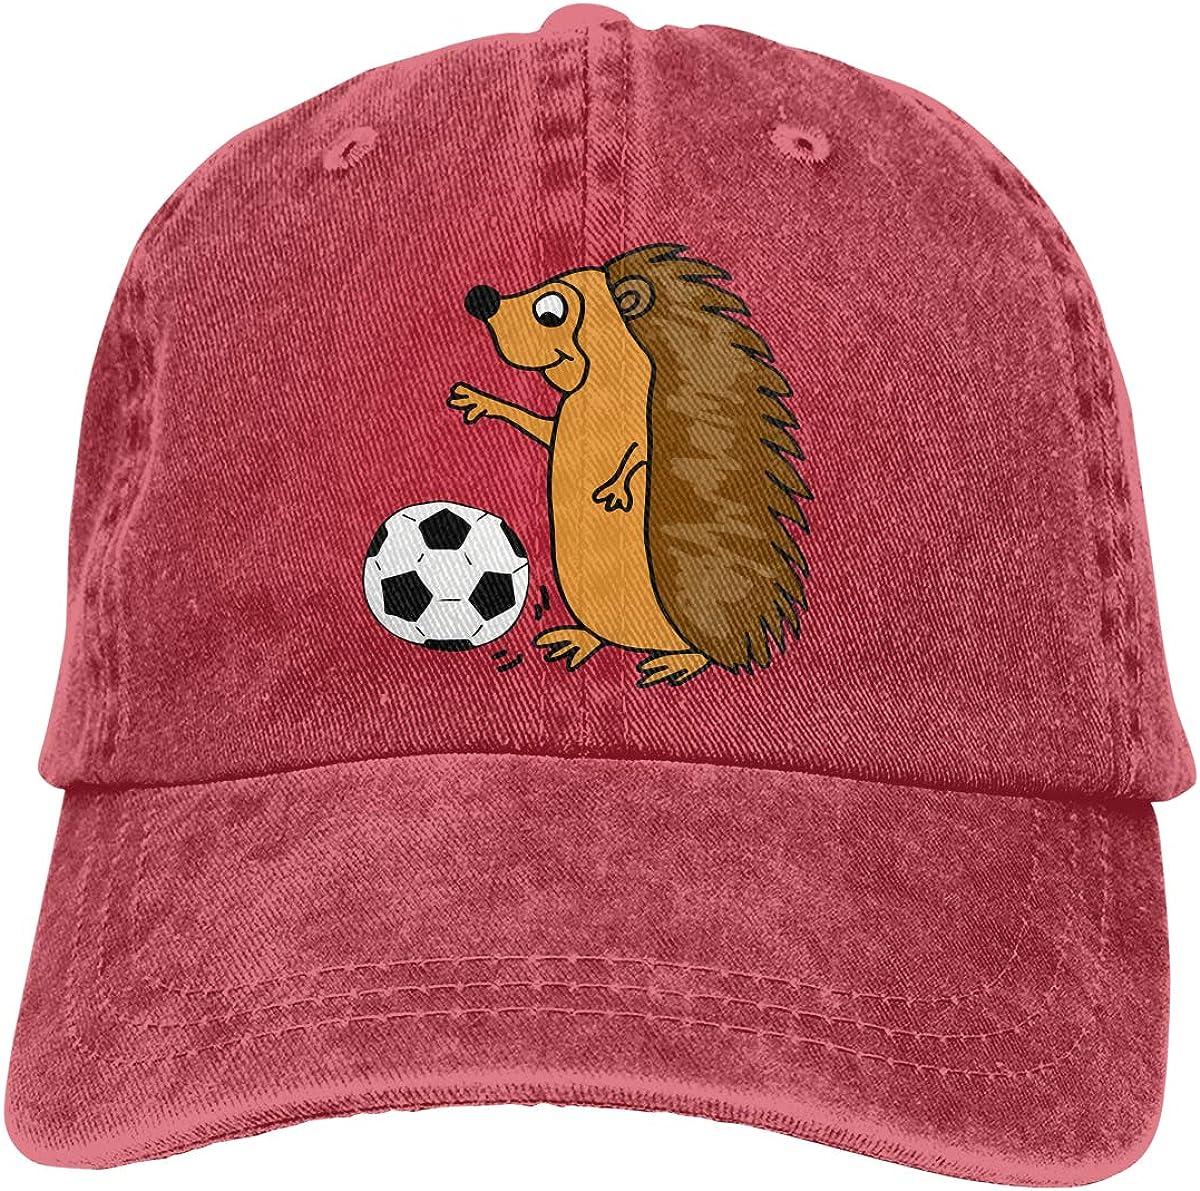 Adult Fashion Cotton Denim Baseball Cap Cute Hedgehog Playing Soccer Cartoon Classic Dad Hat Adjustable Plain Cap